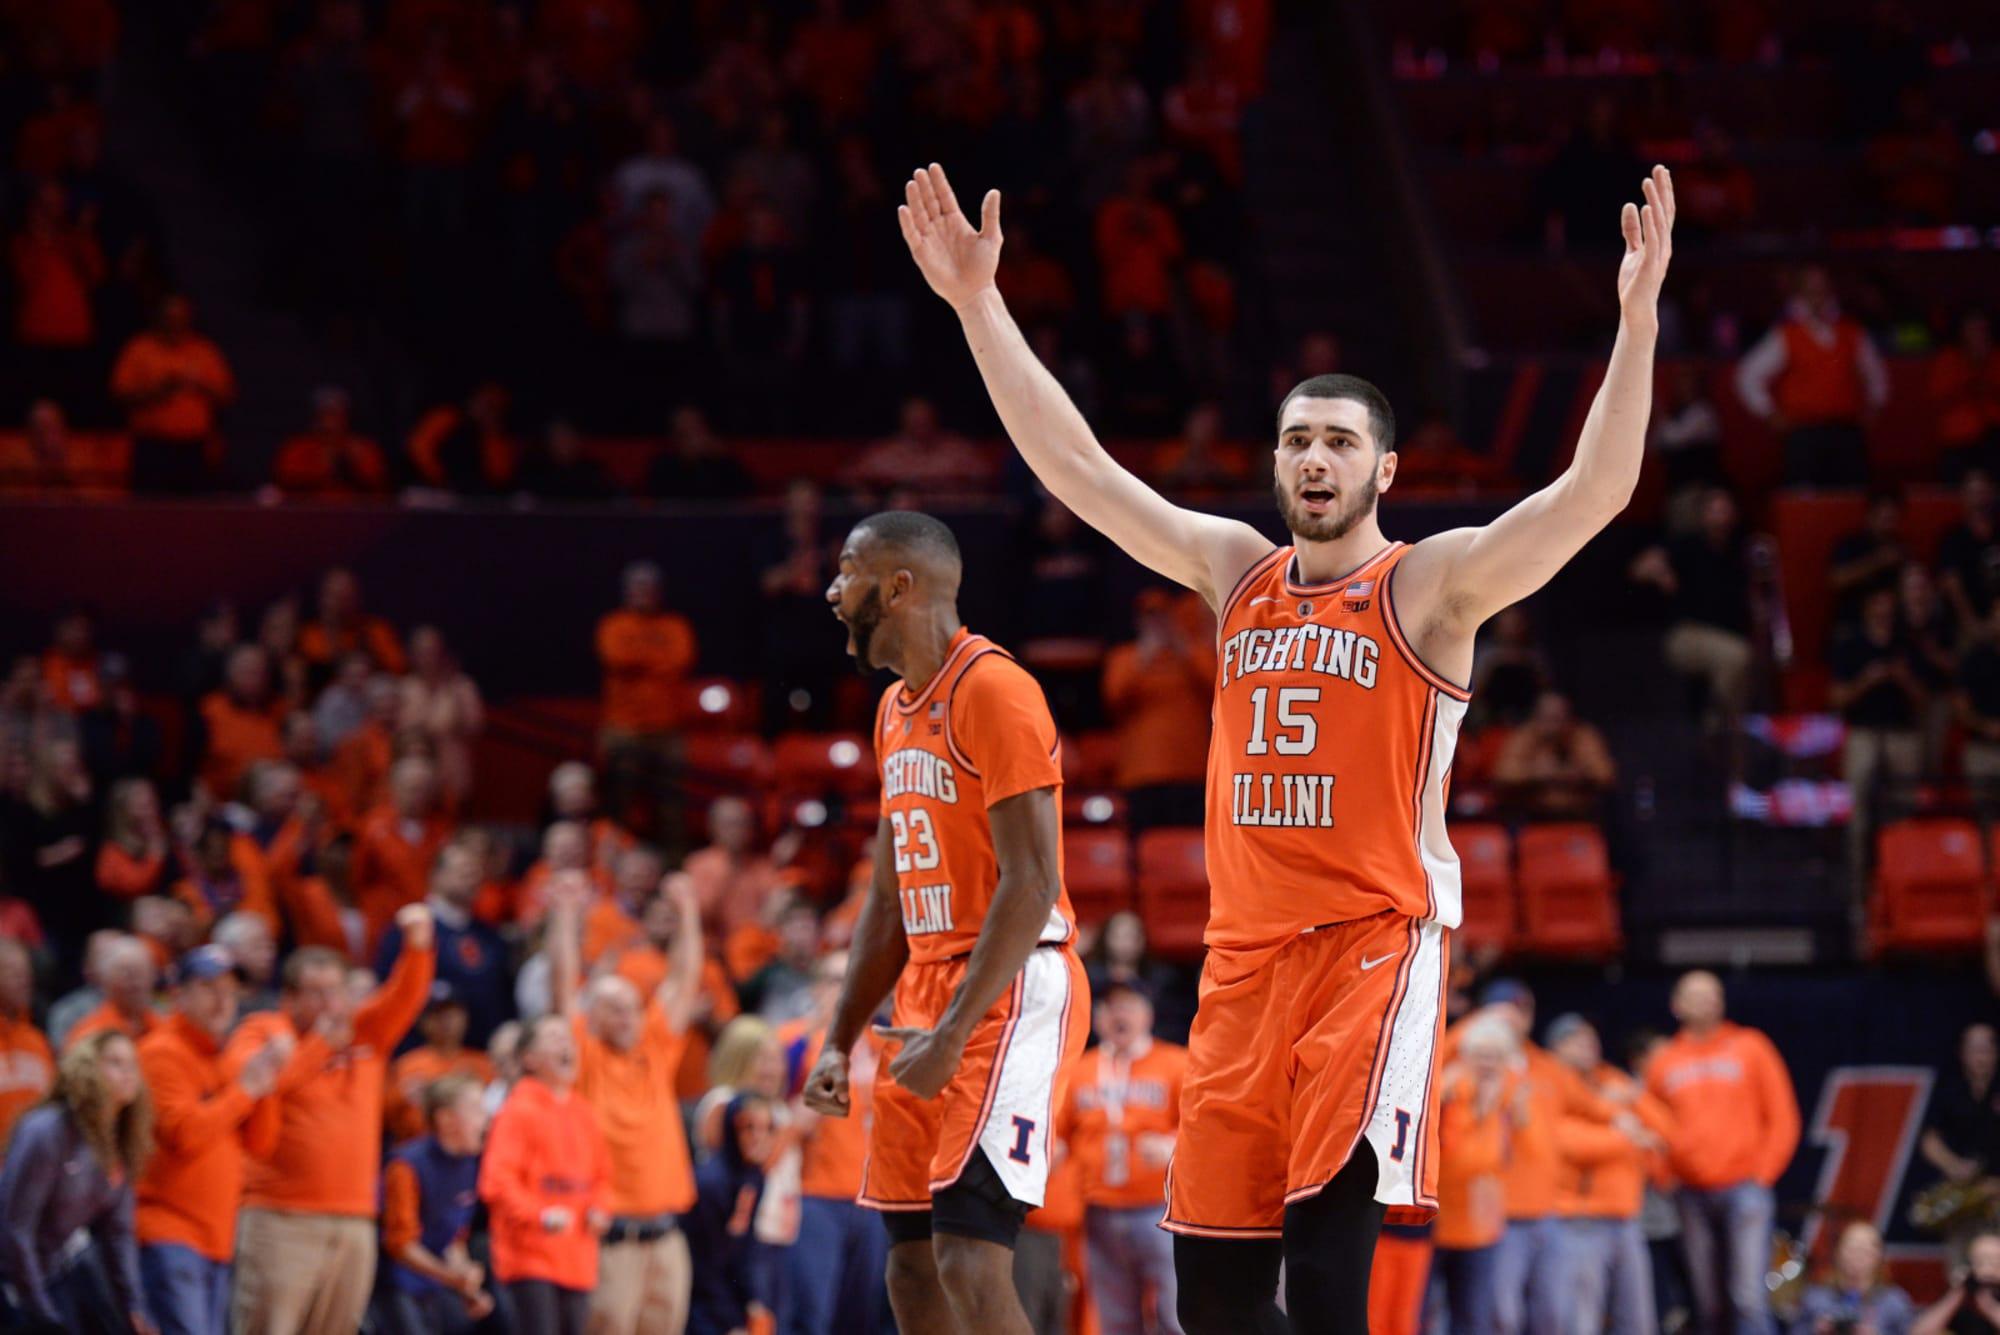 Illinois Basketball: 2018-19 Illini season wrap-up for Giorgi ...